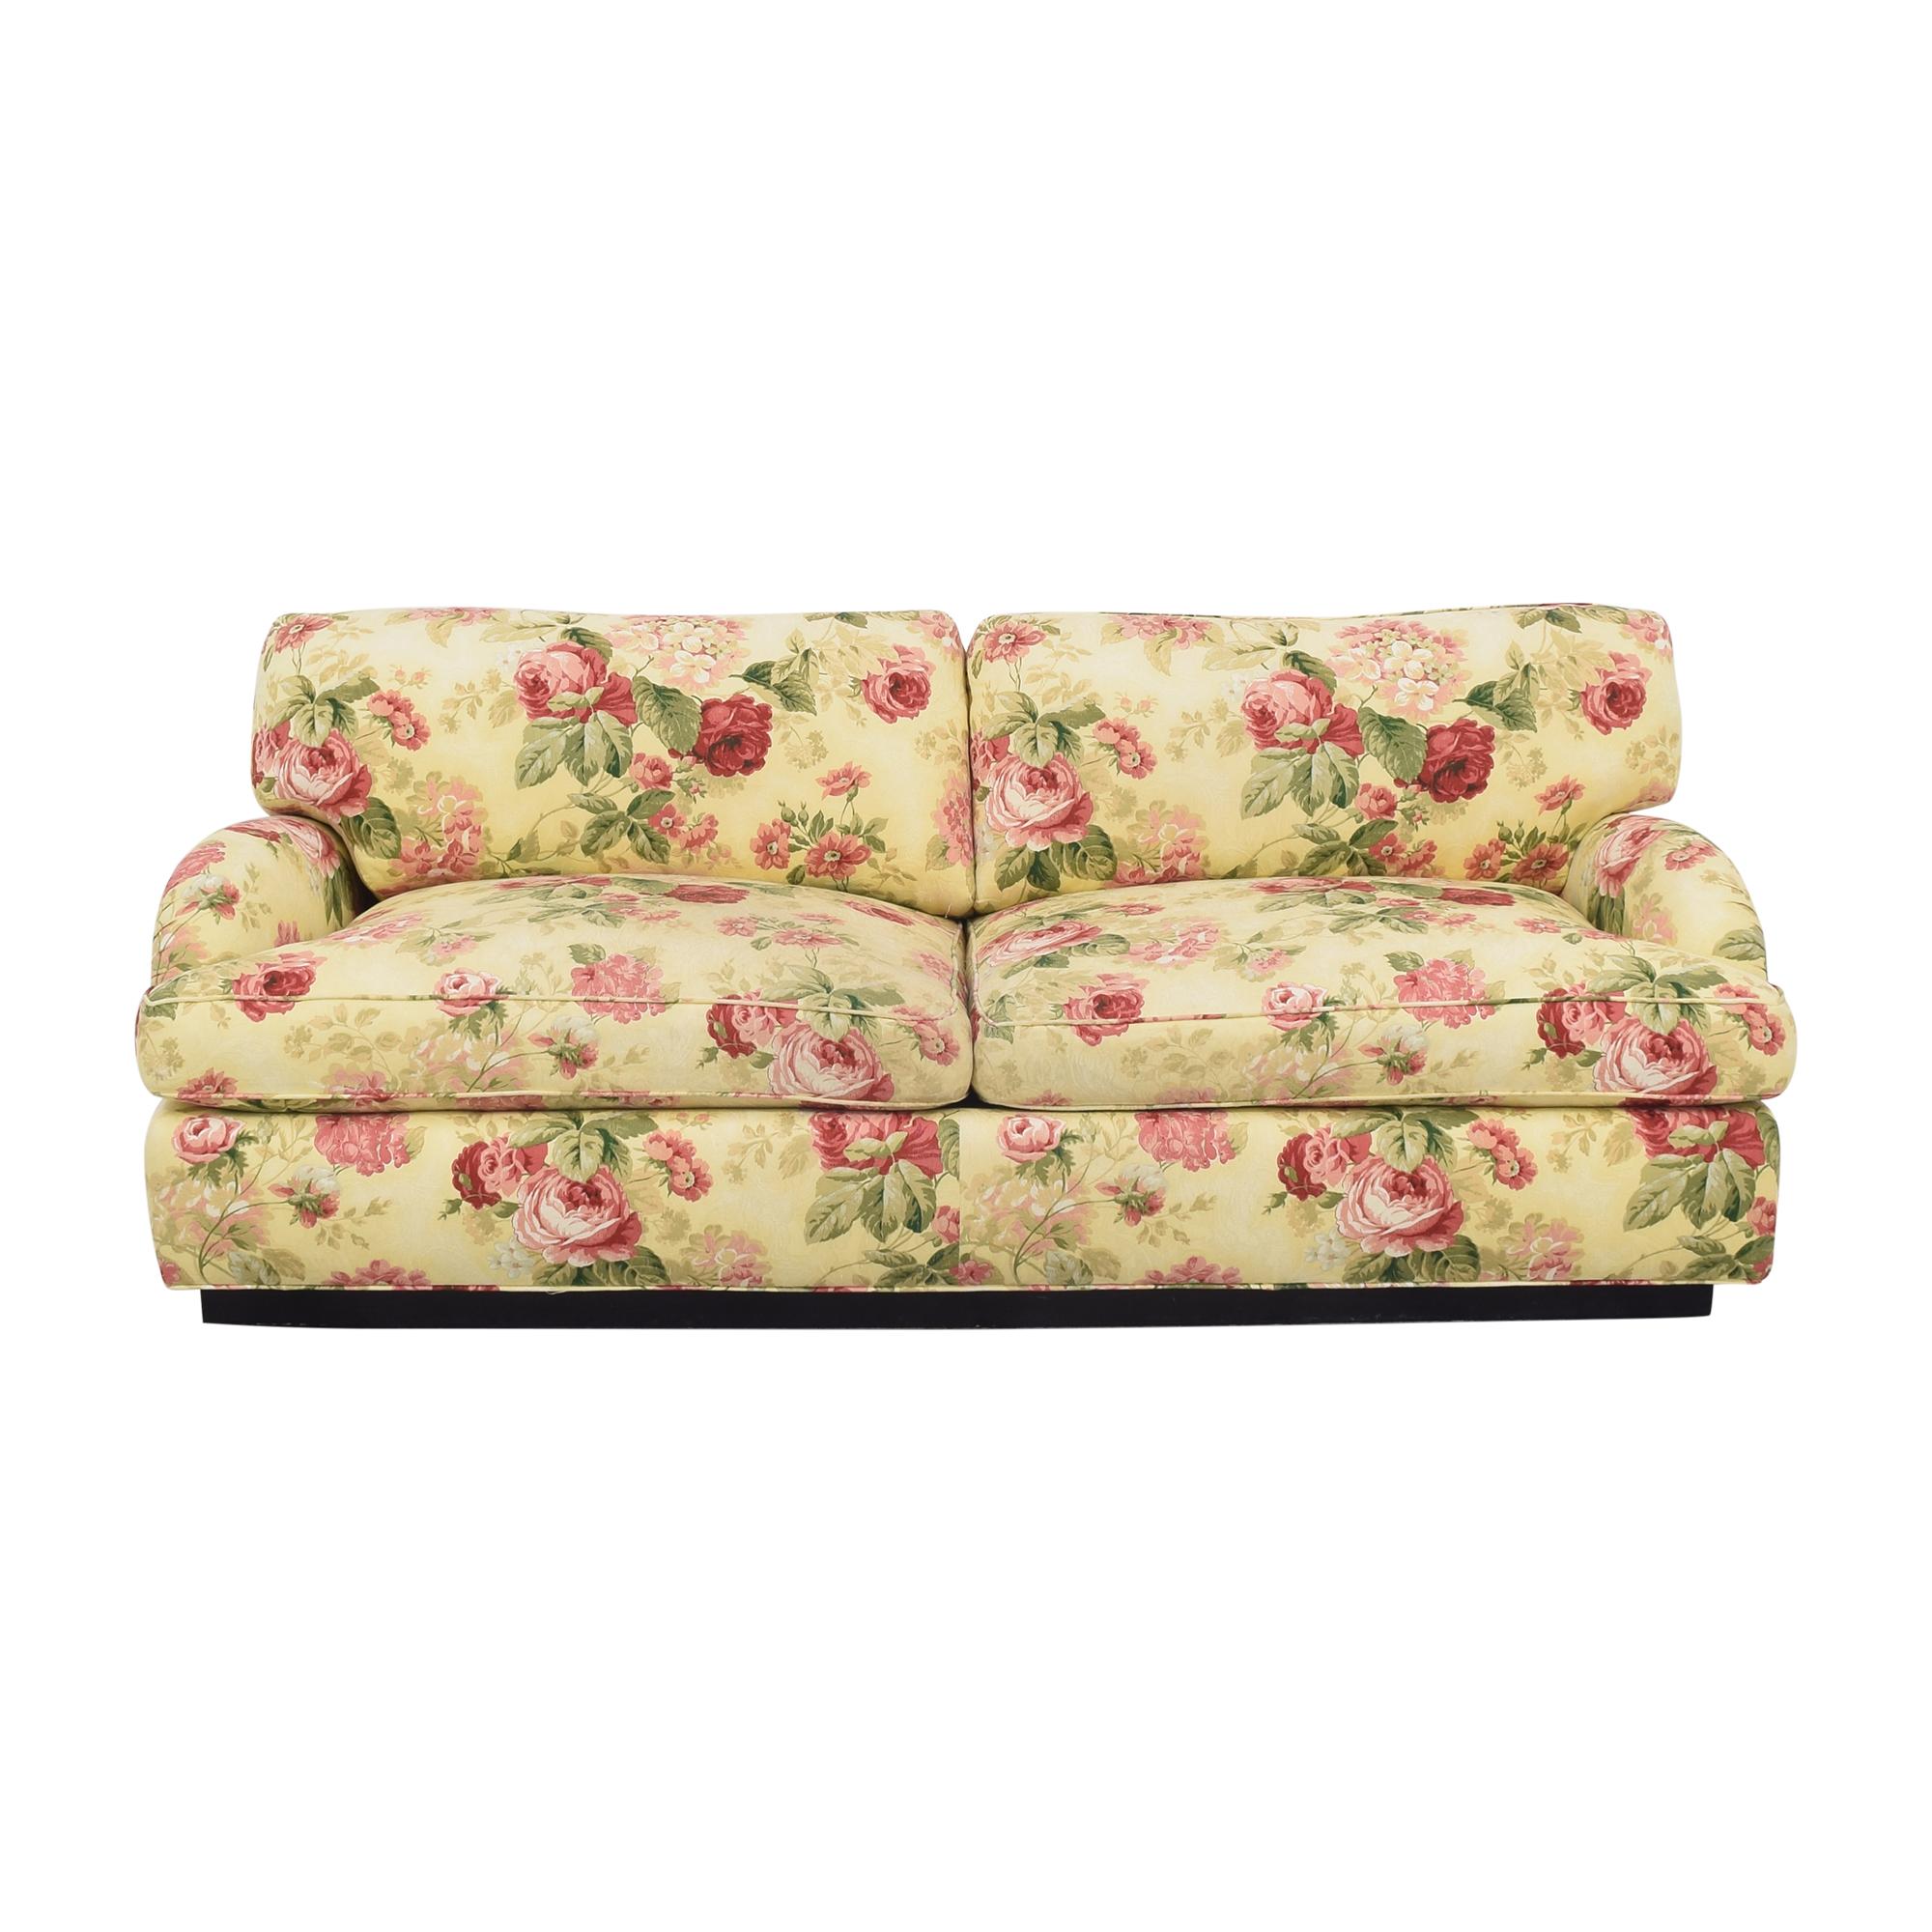 Greenbaum Interiors Greenbaum Two Cushion Sofa second hand